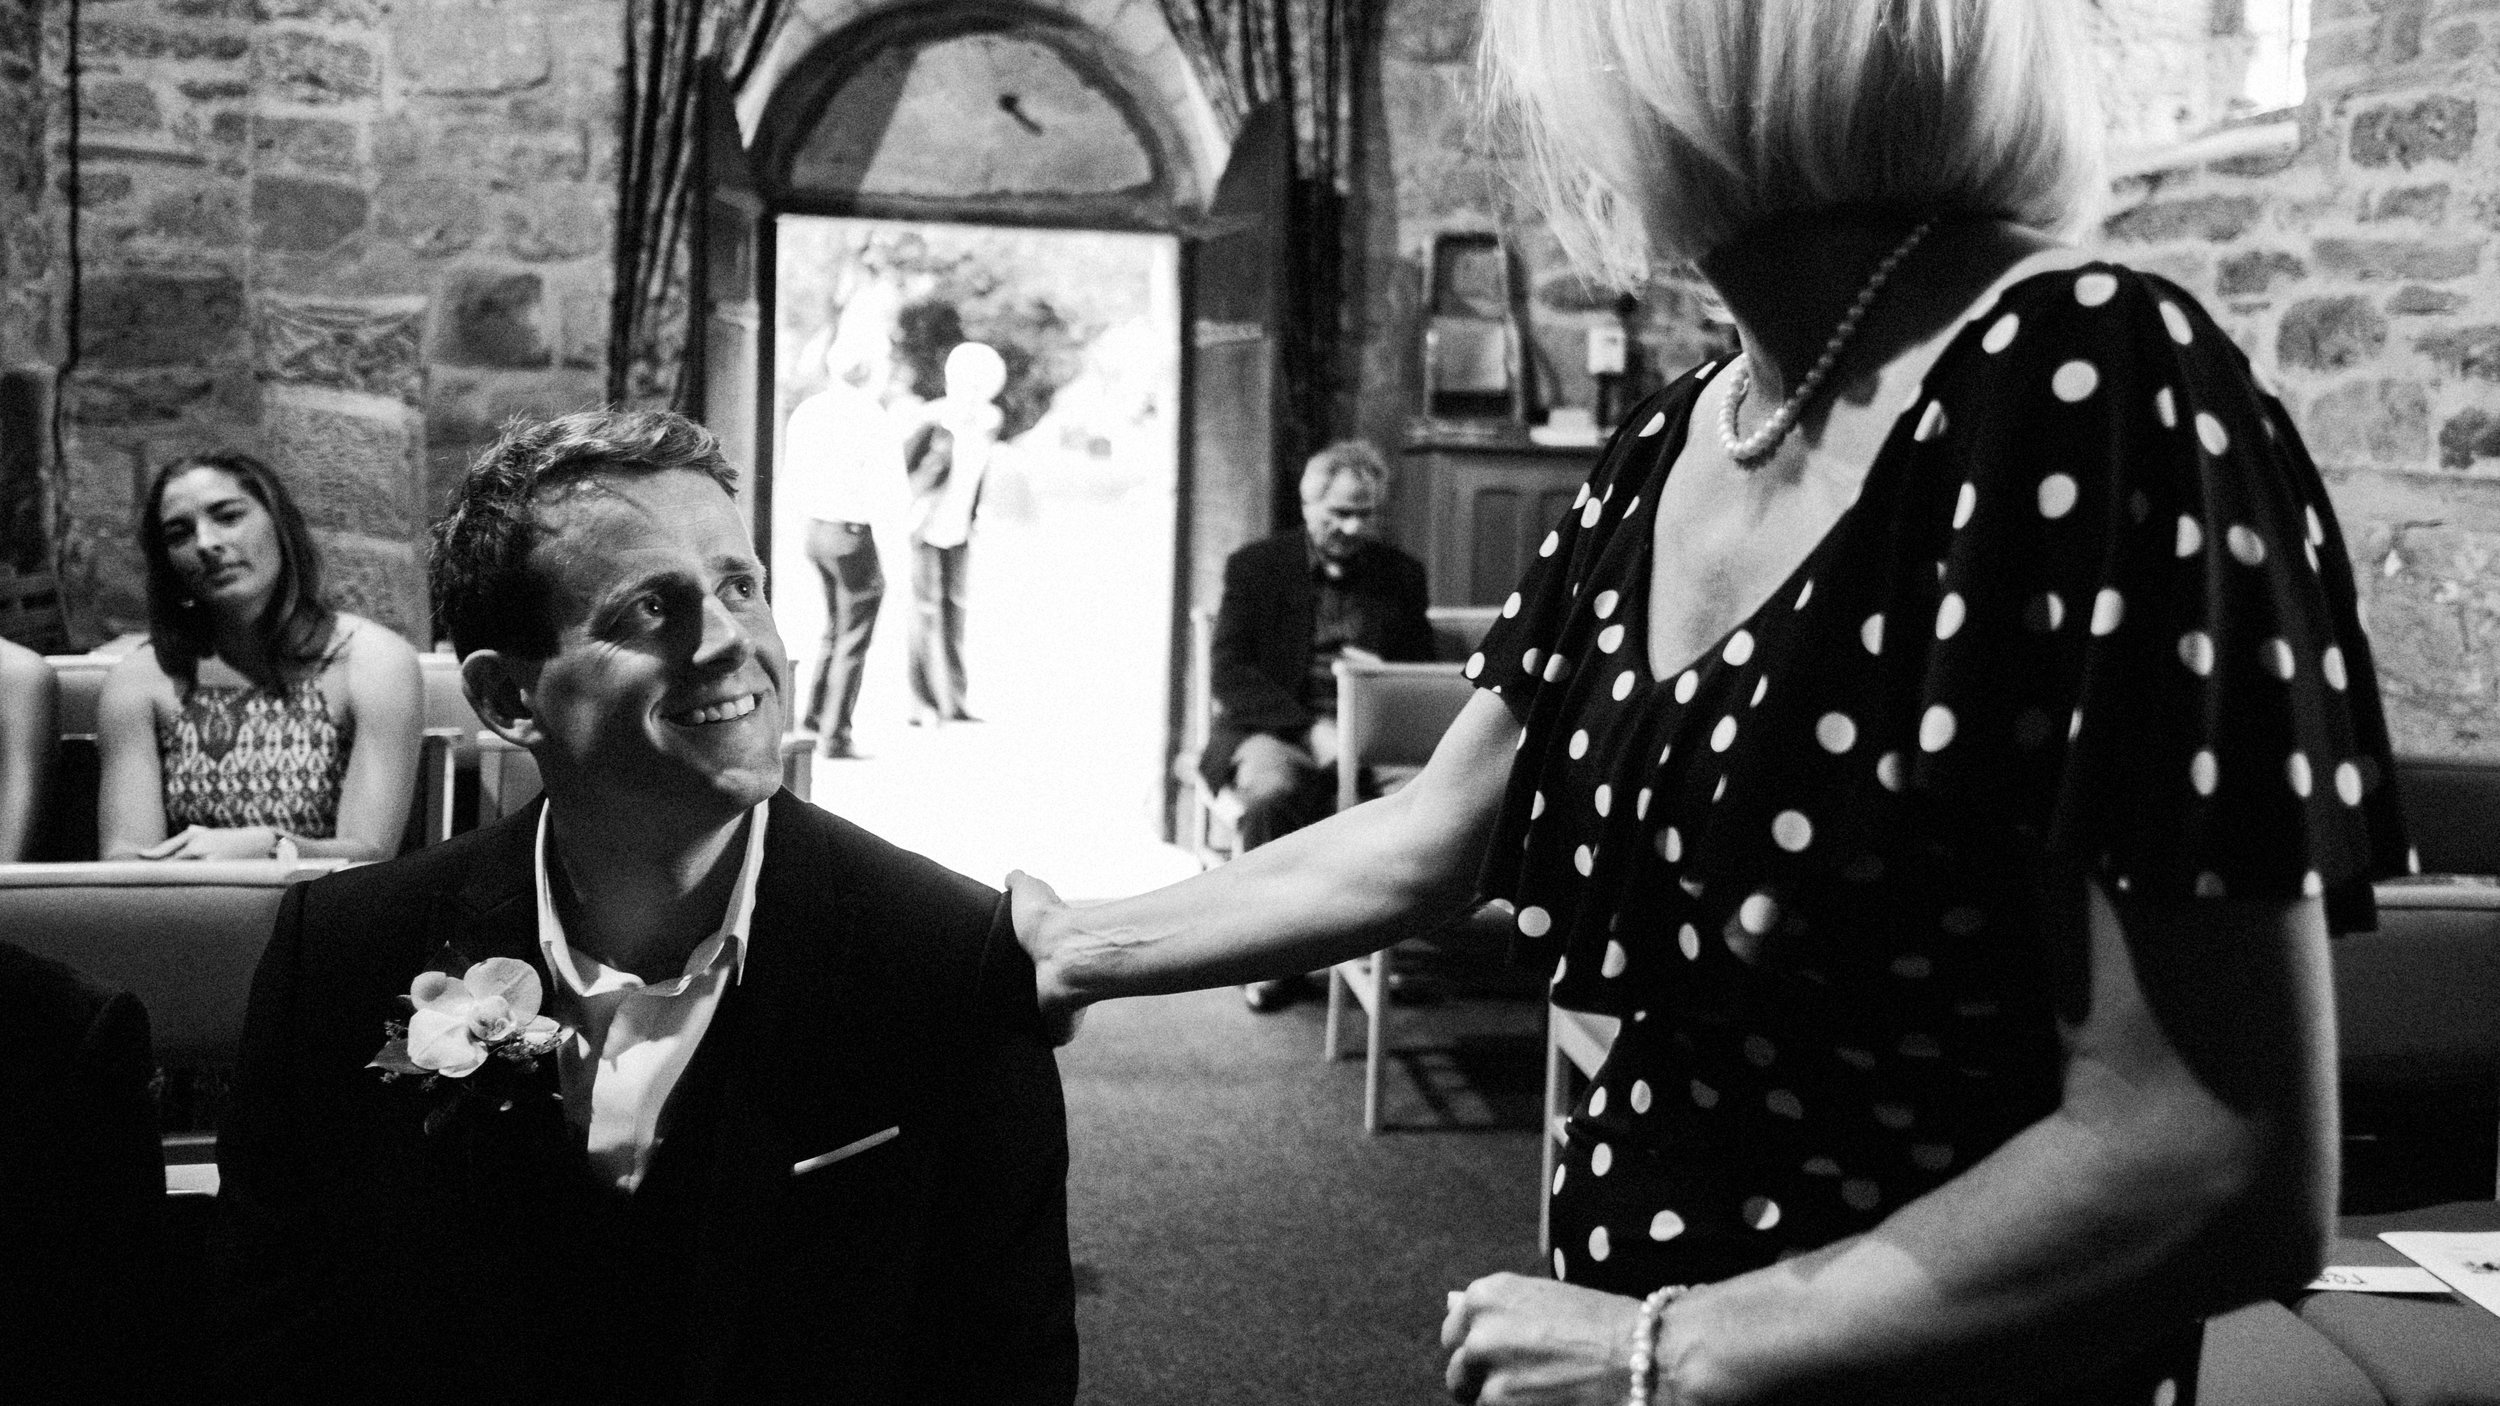 prestbury-cheshire-wedding-photographer-0004.JPG